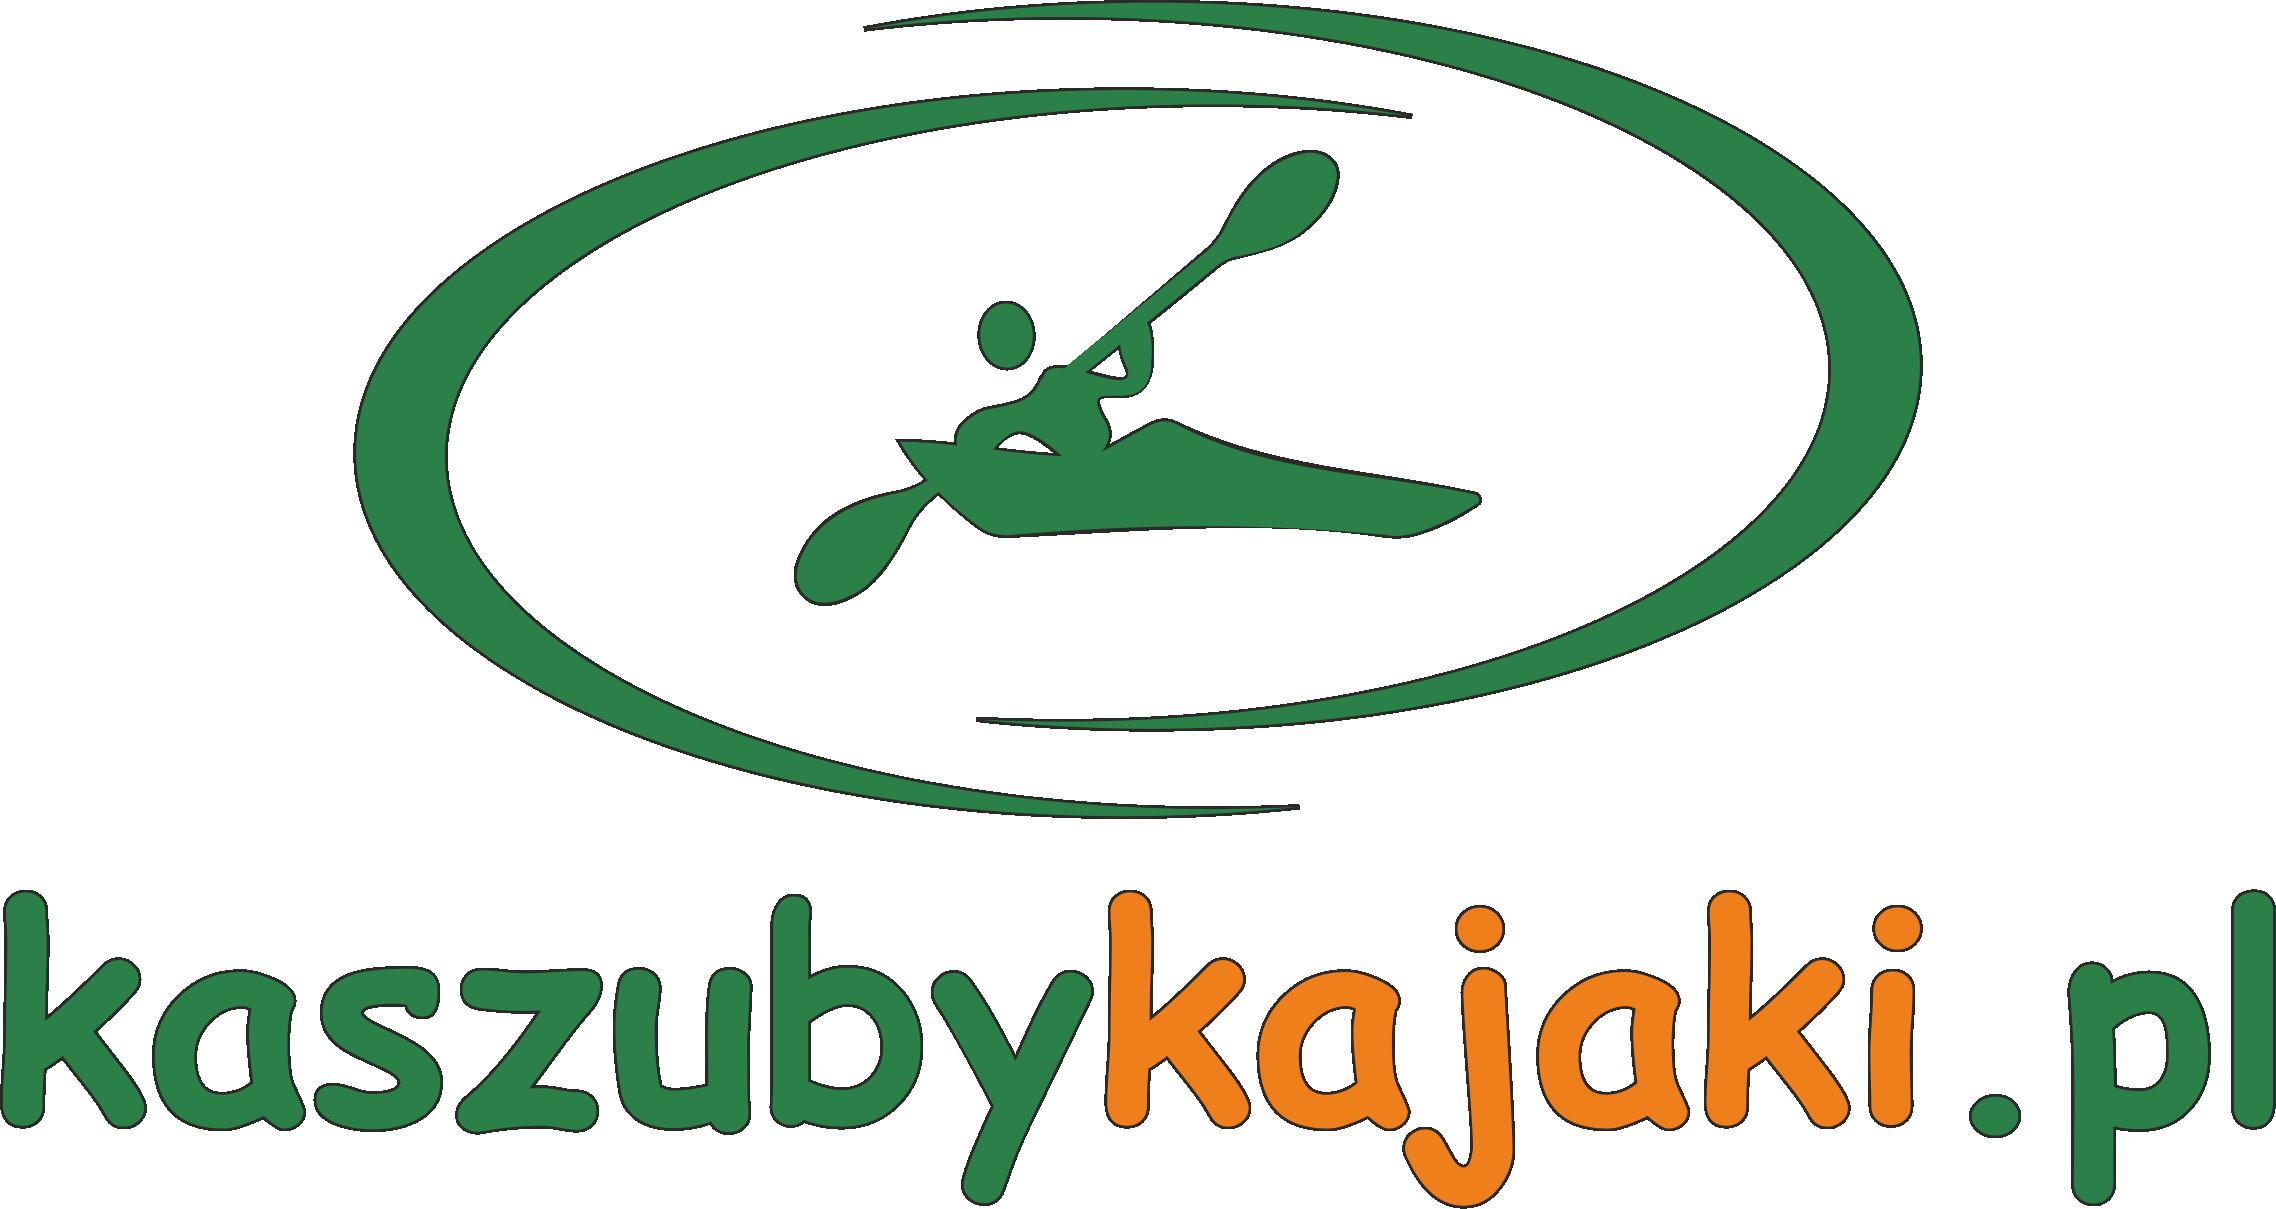 Kaszubykajaki.pl